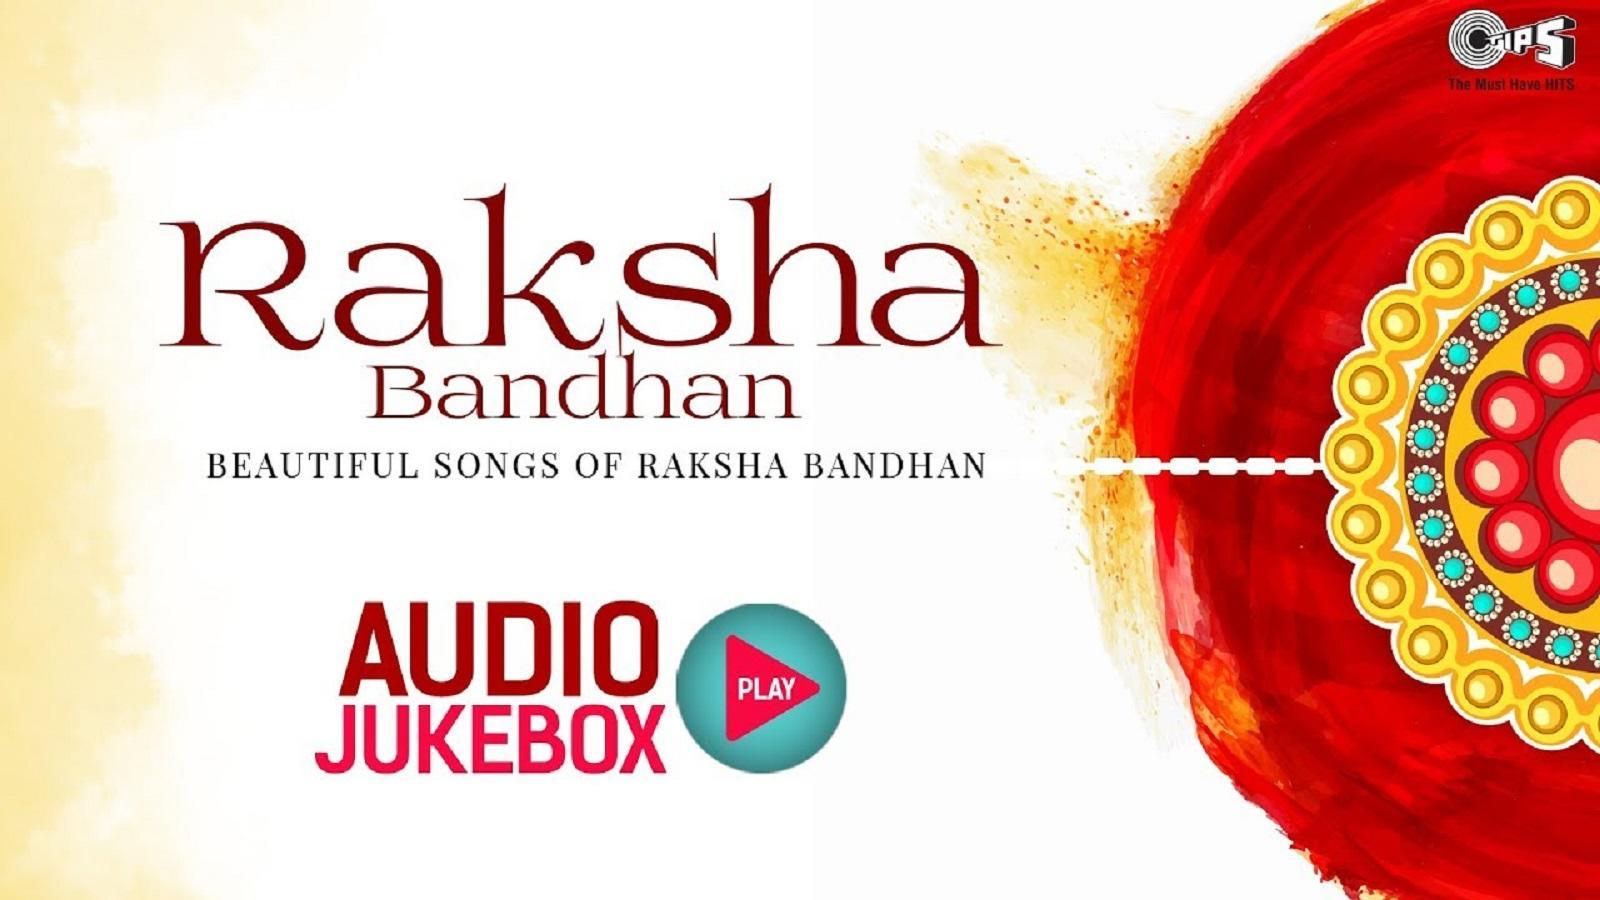 Rakhi Special: Best Hindi Songs for Rakhi in 'Raksha Bandhan Audio Jukebox'  sung by Alka Yagnik, Kumar Sanu, Udit Narayan and more